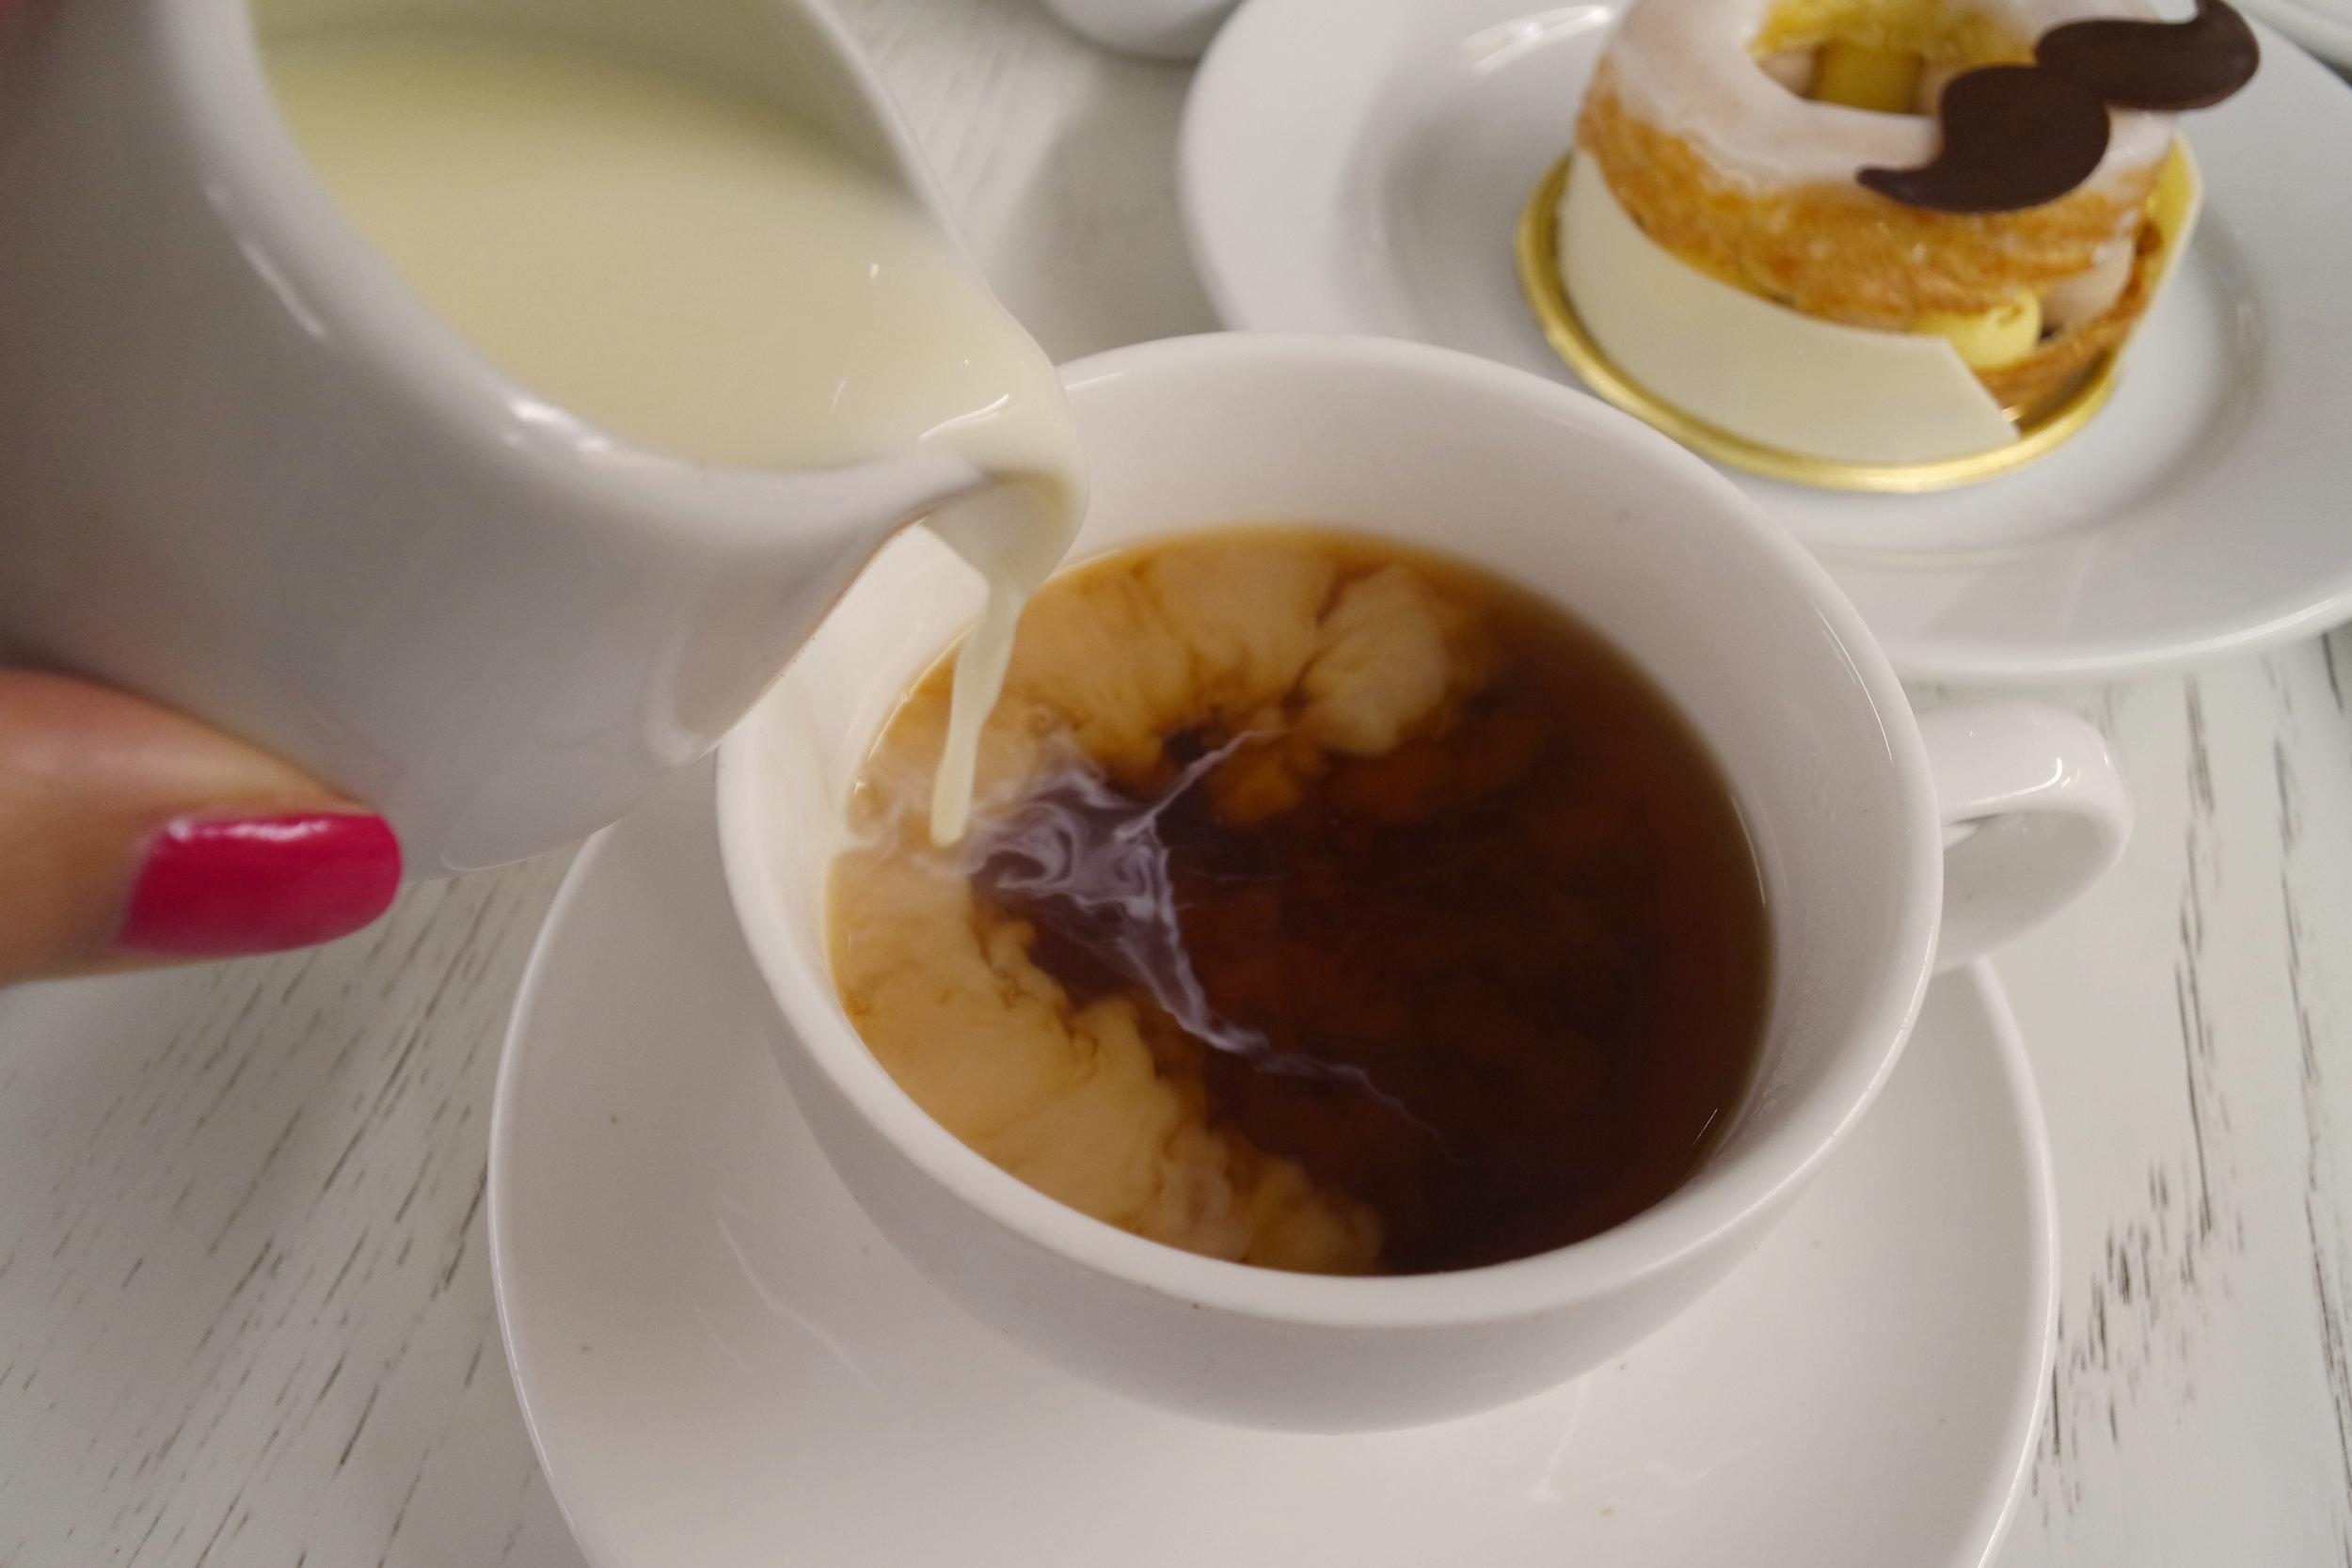 tea dominique ansel bakery london